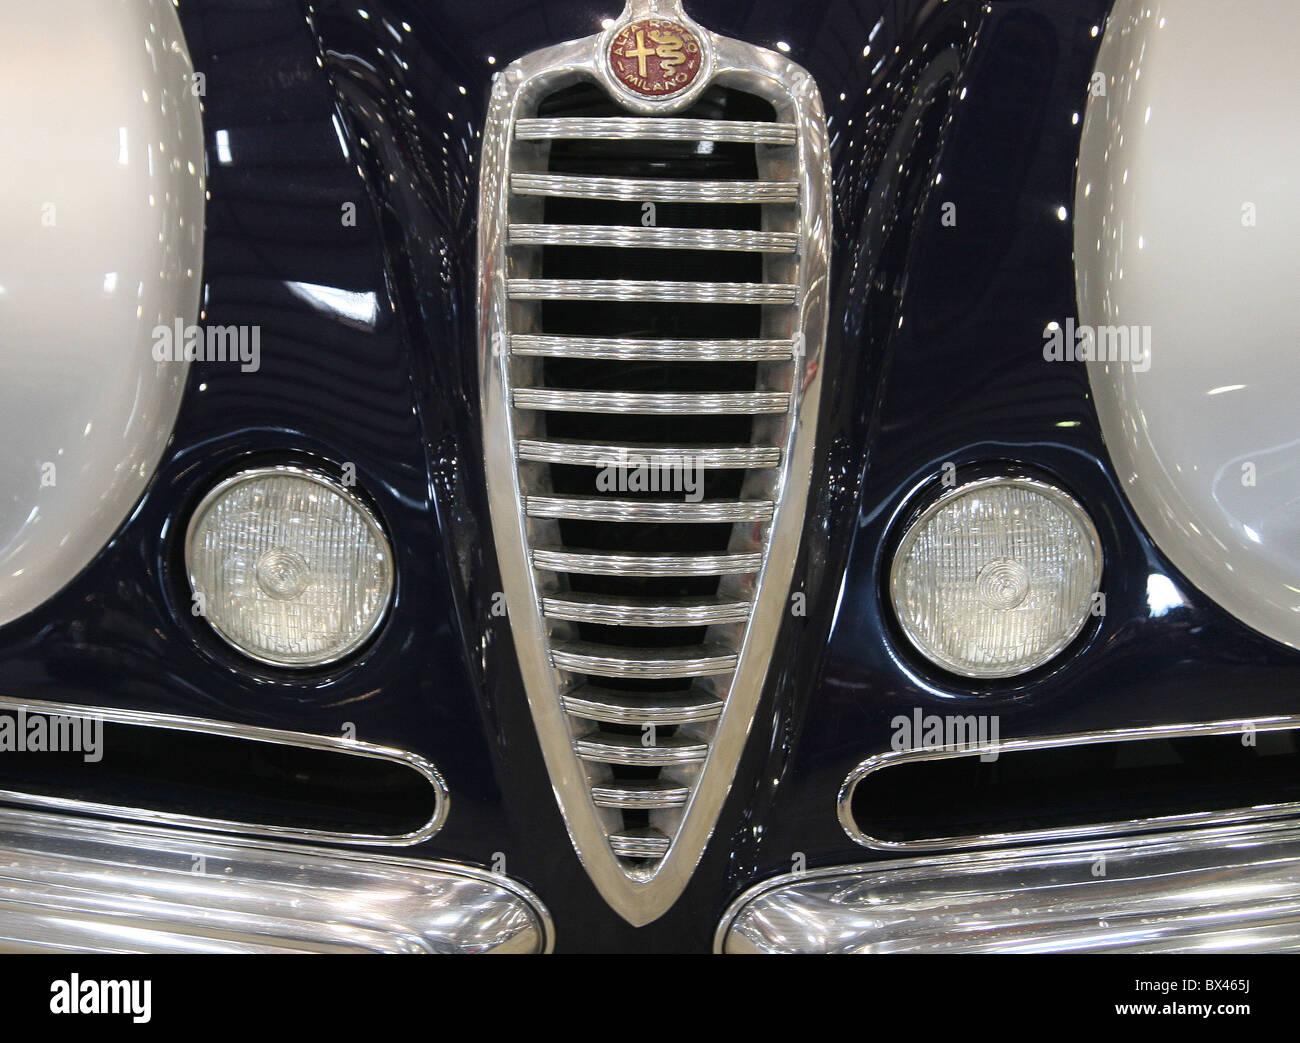 Design of a car radiator - Stock Photo Car Radiator Grills